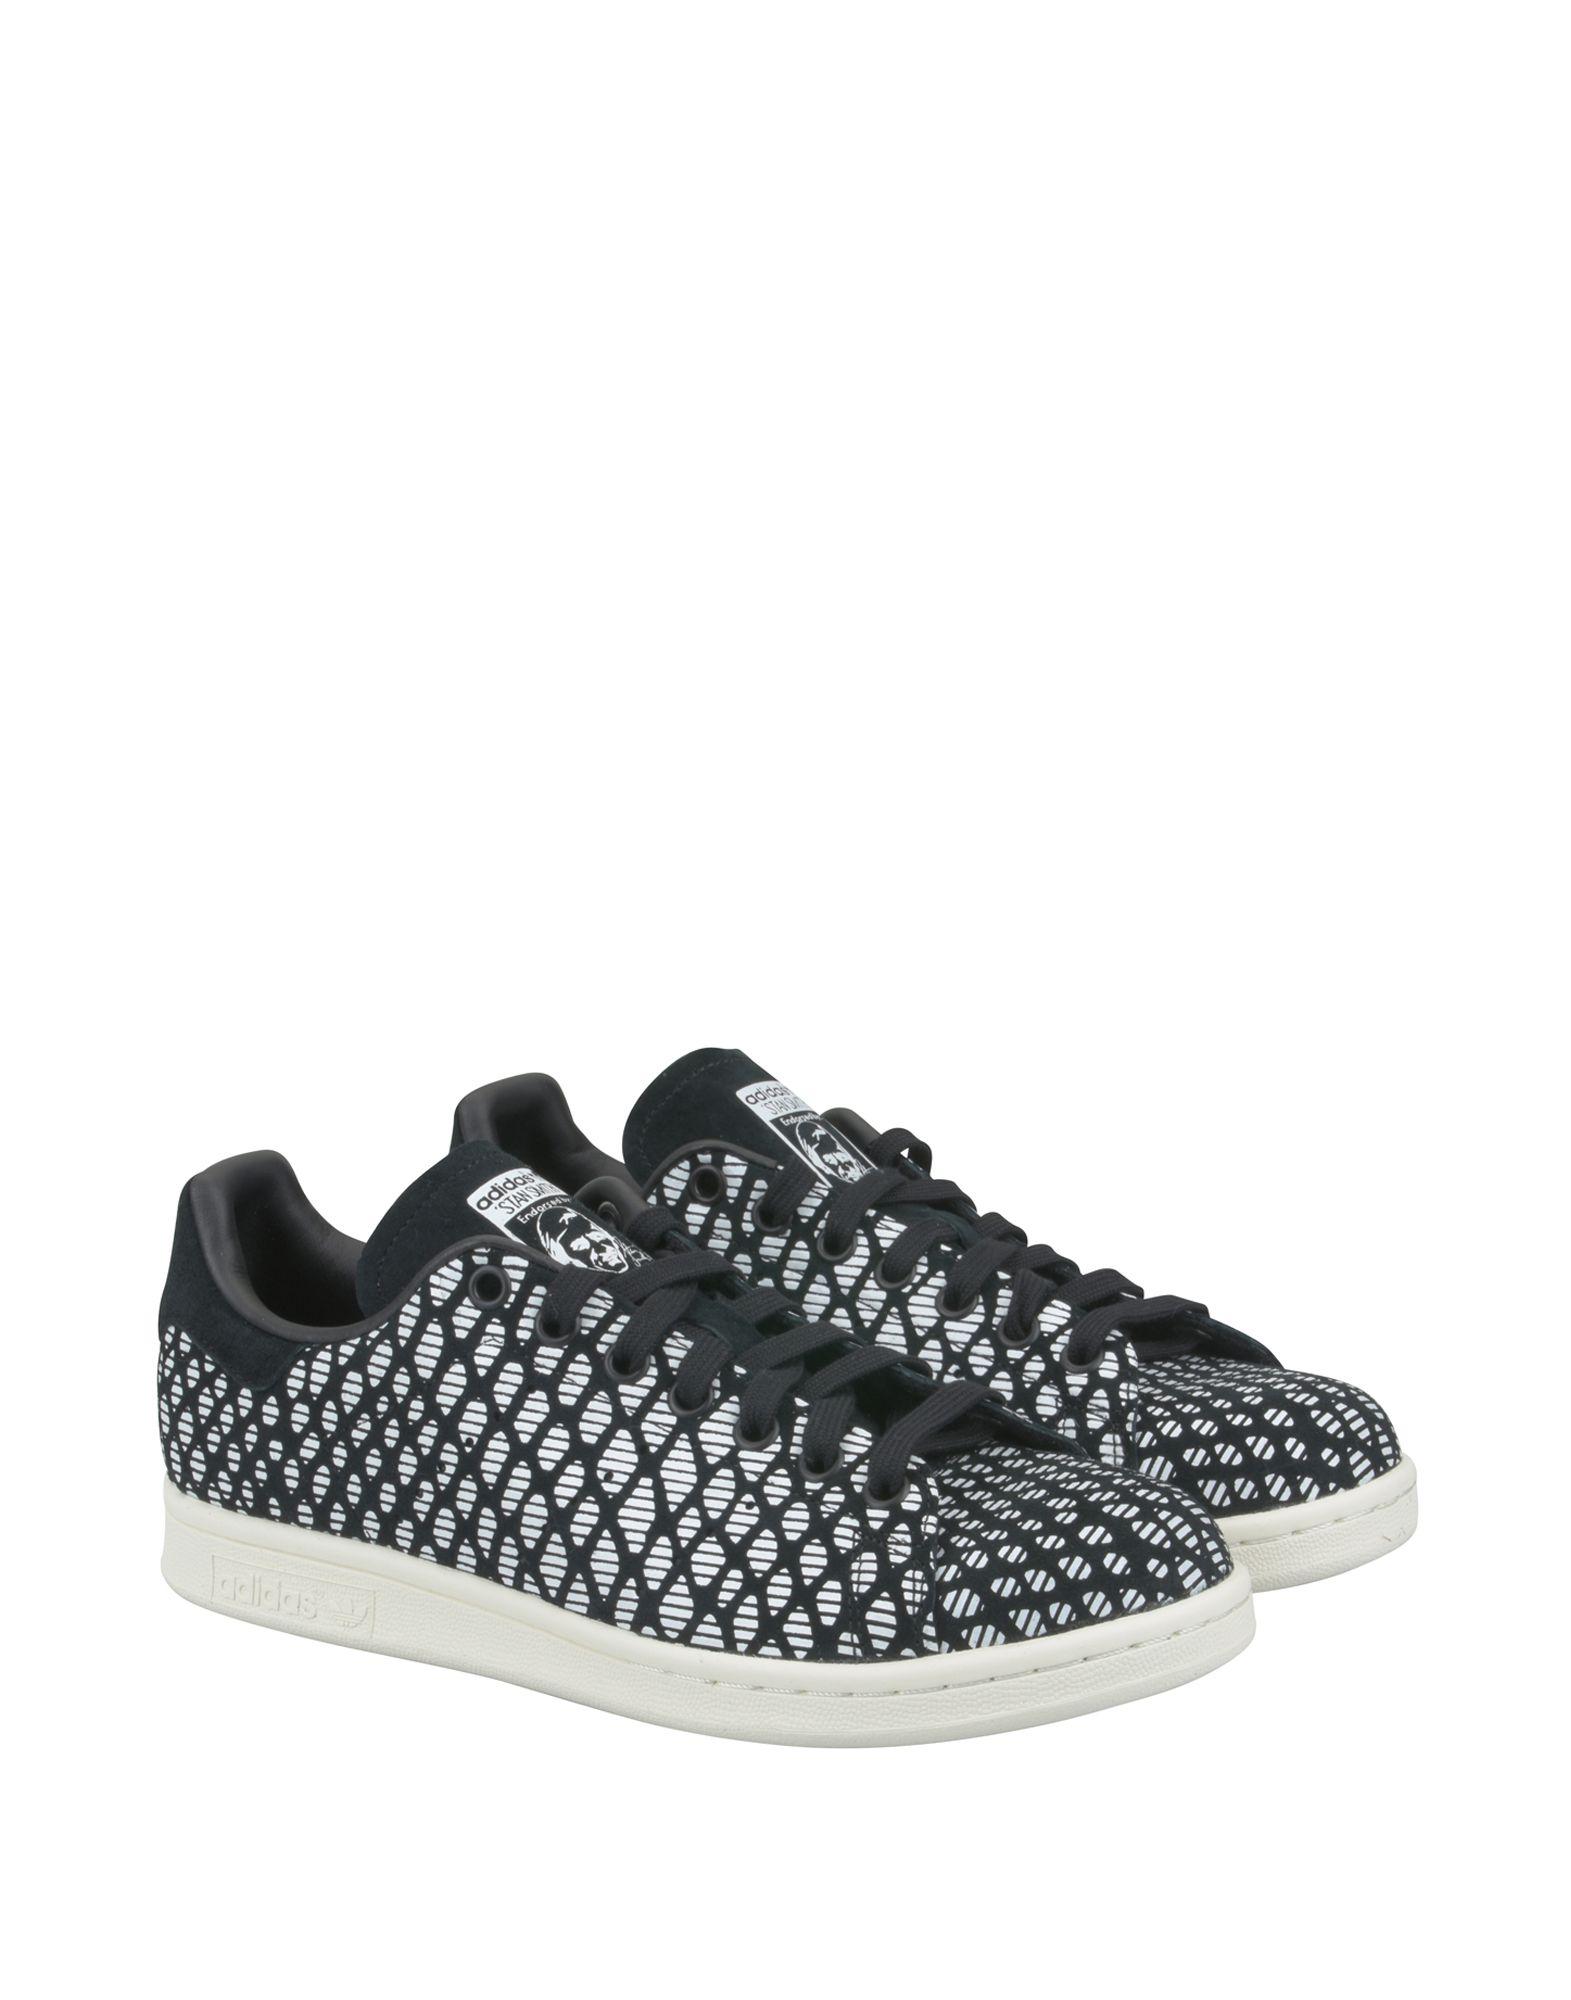 Adidas Originals Adidas Stansmith  11403028GO Schuhe Gute Qualität beliebte Schuhe 11403028GO 1a59f8